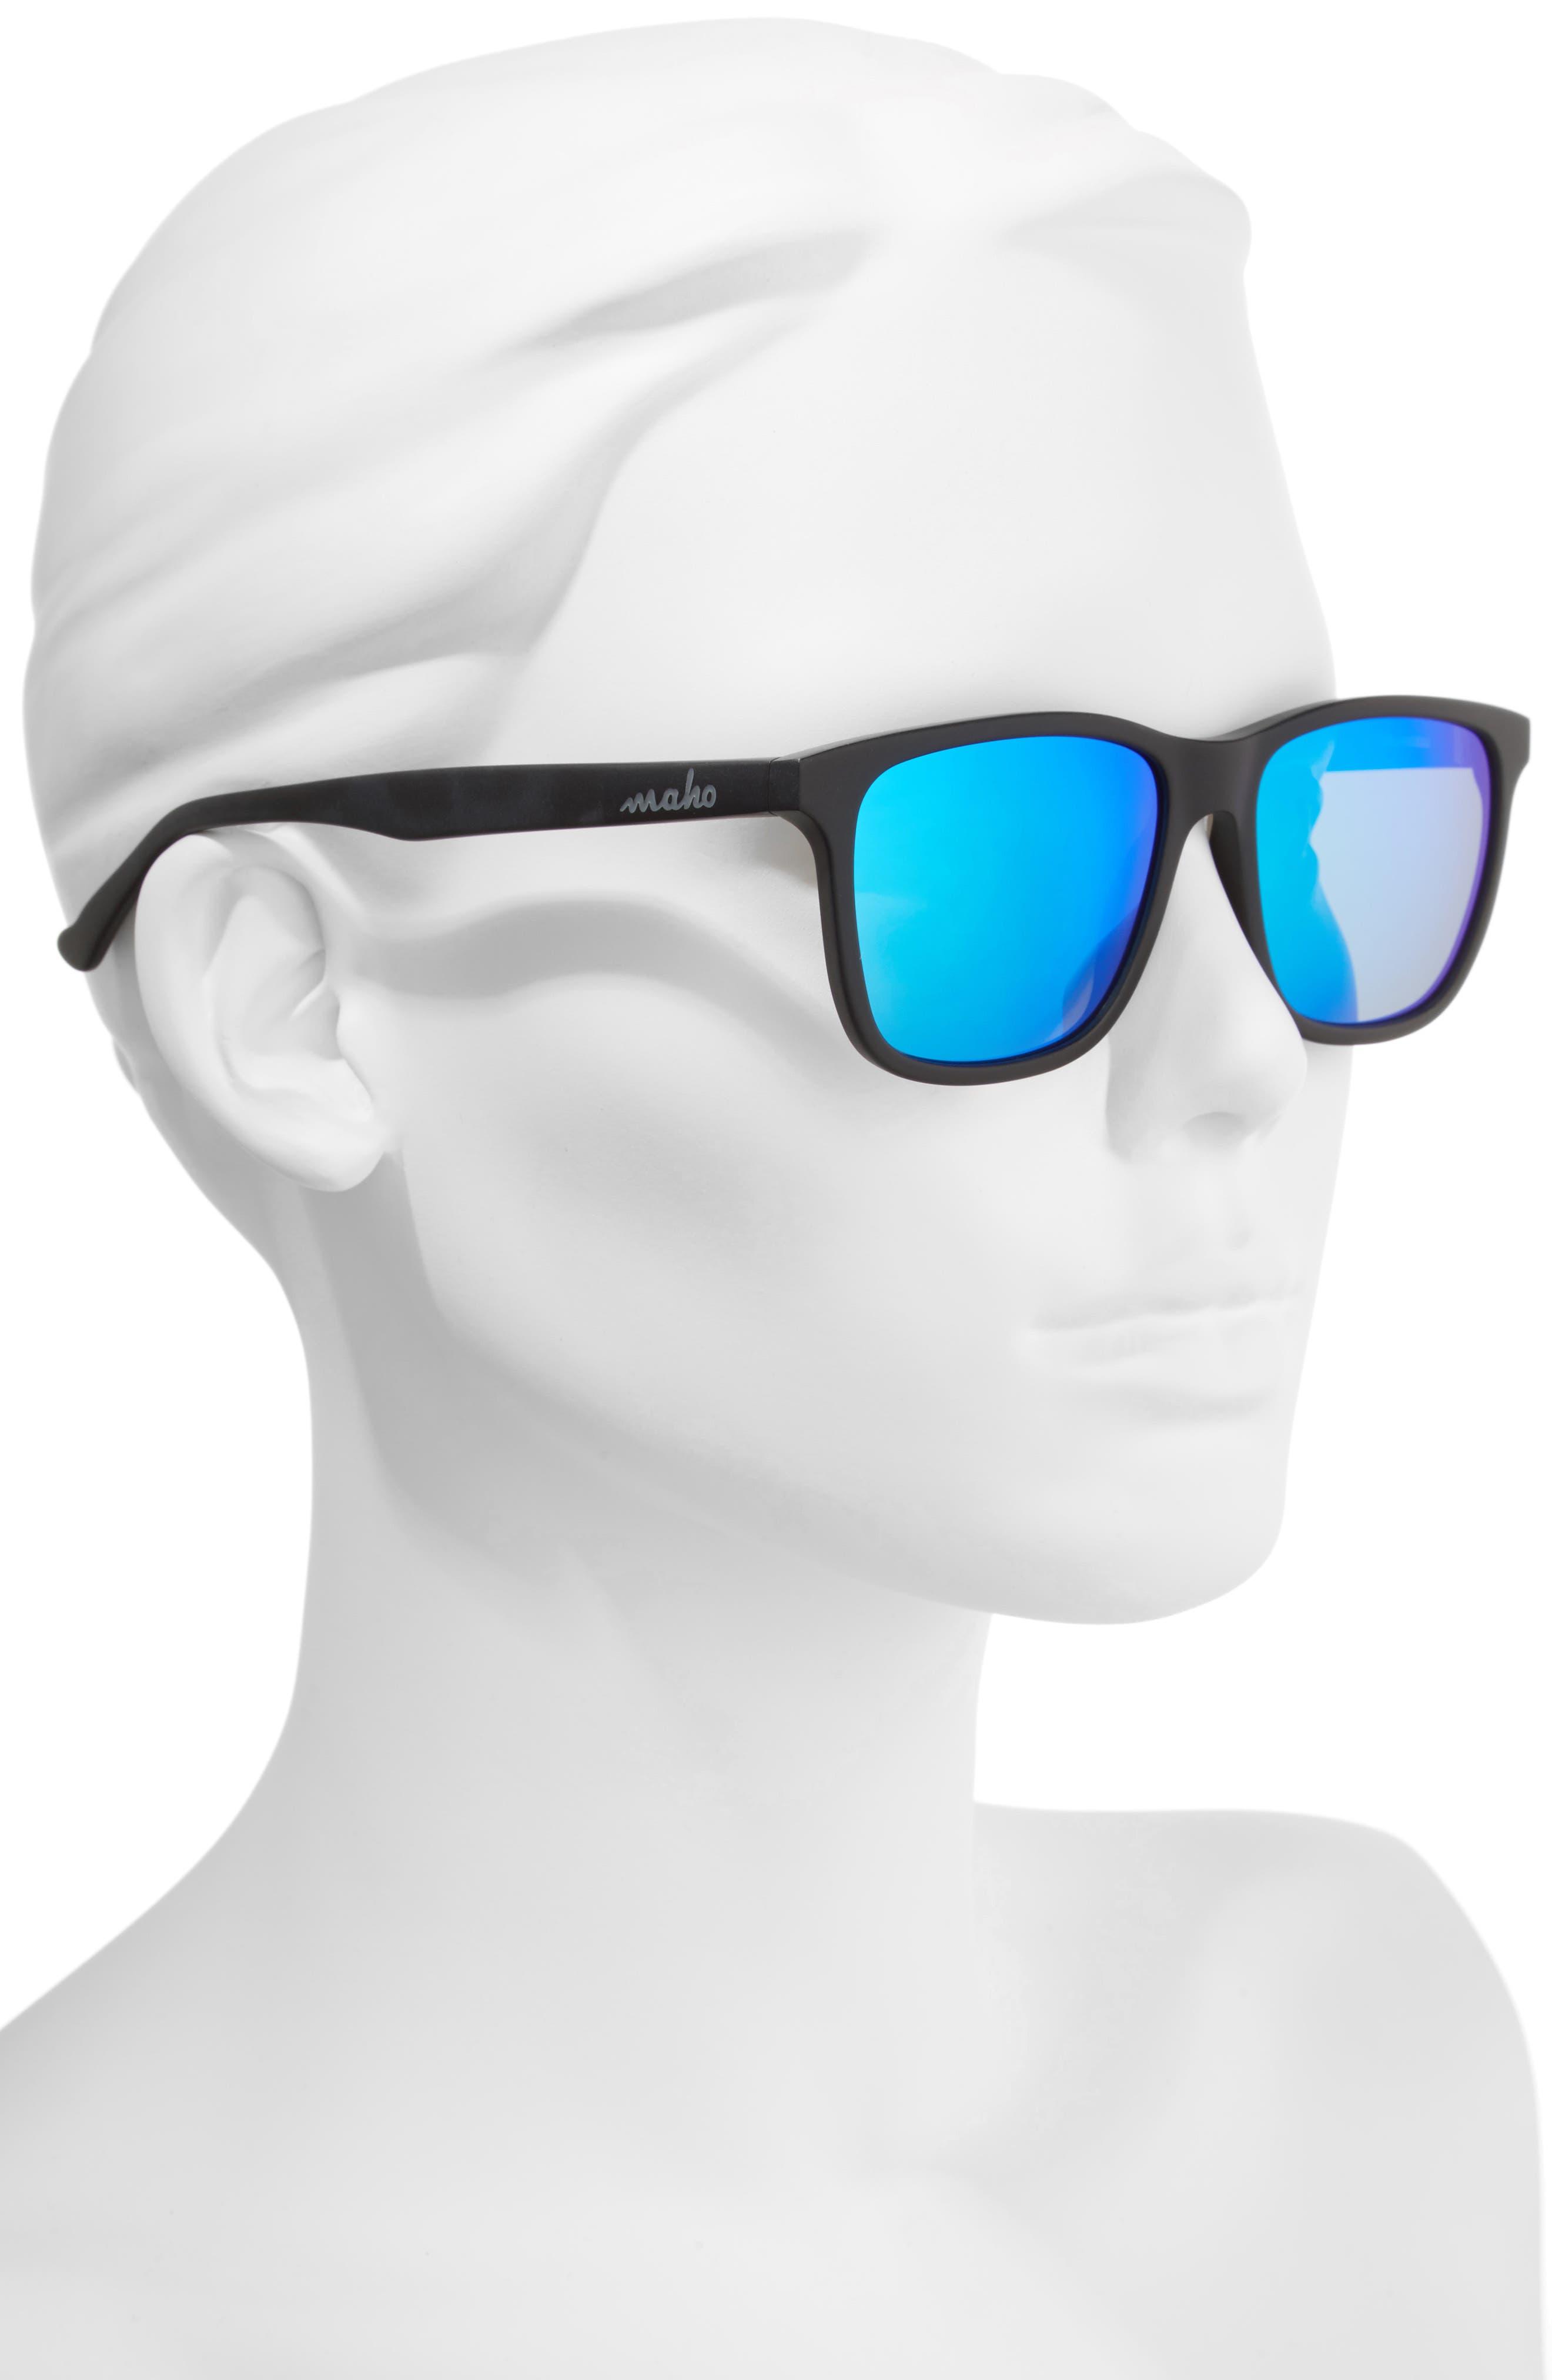 Uluwatu 52mm Polarized Sunglasses,                             Alternate thumbnail 2, color,                             020